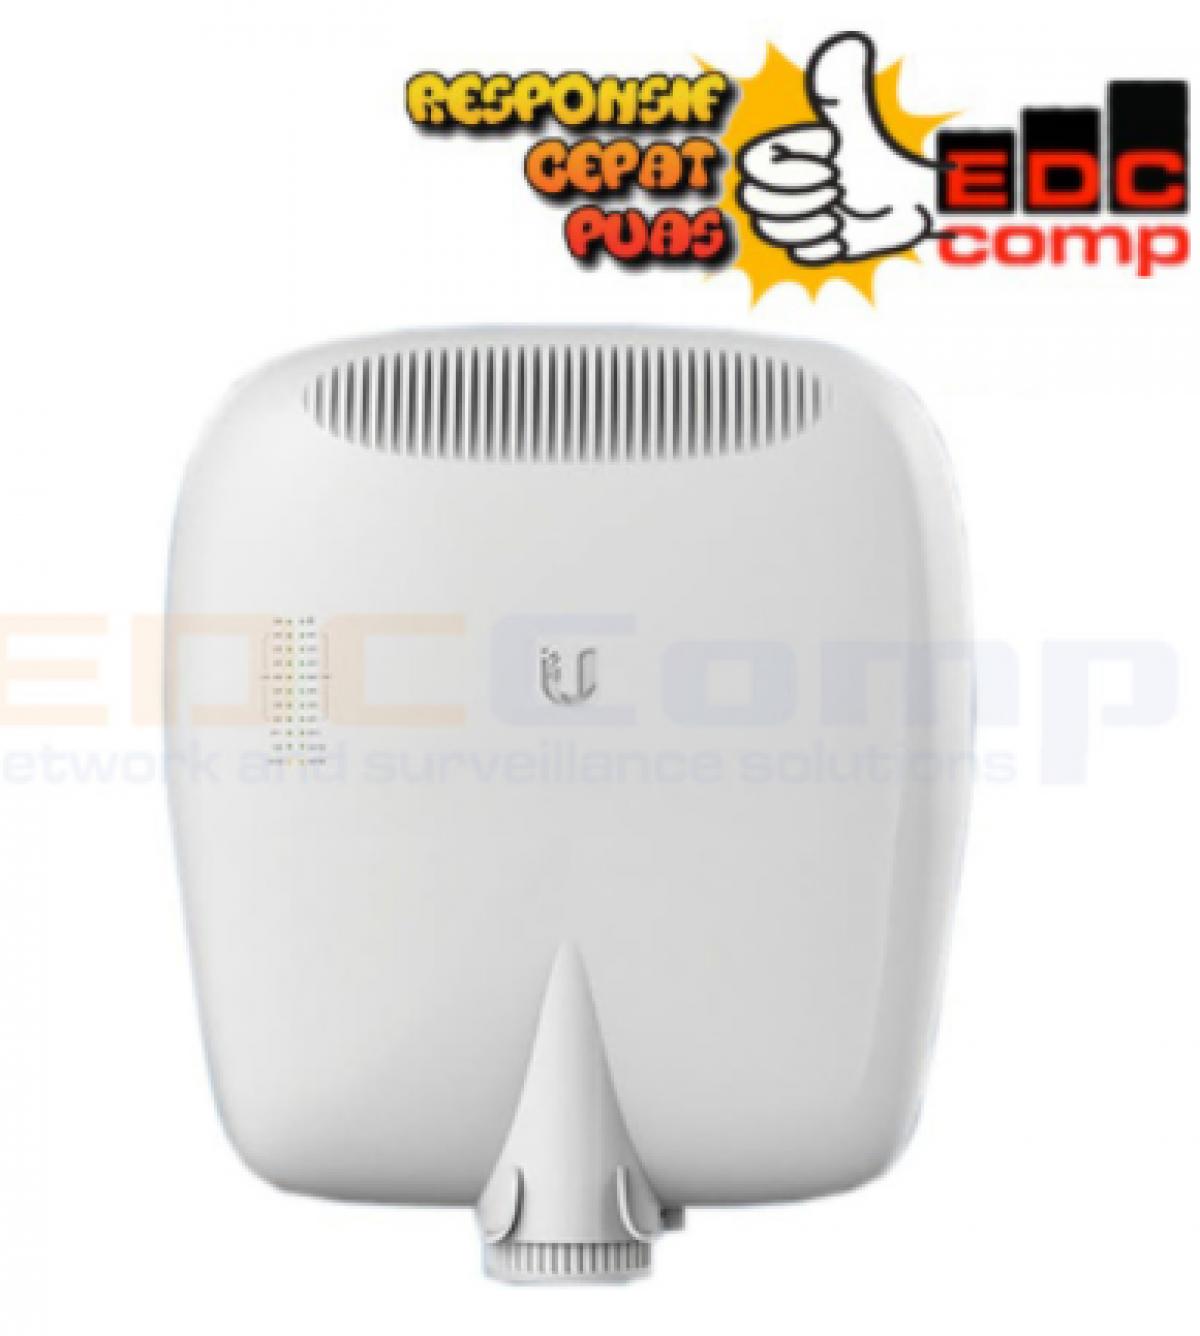 Ubiquiti EP-S16 EdgePoint 16-Port Gigabit PoE Outdoor - EdcComp